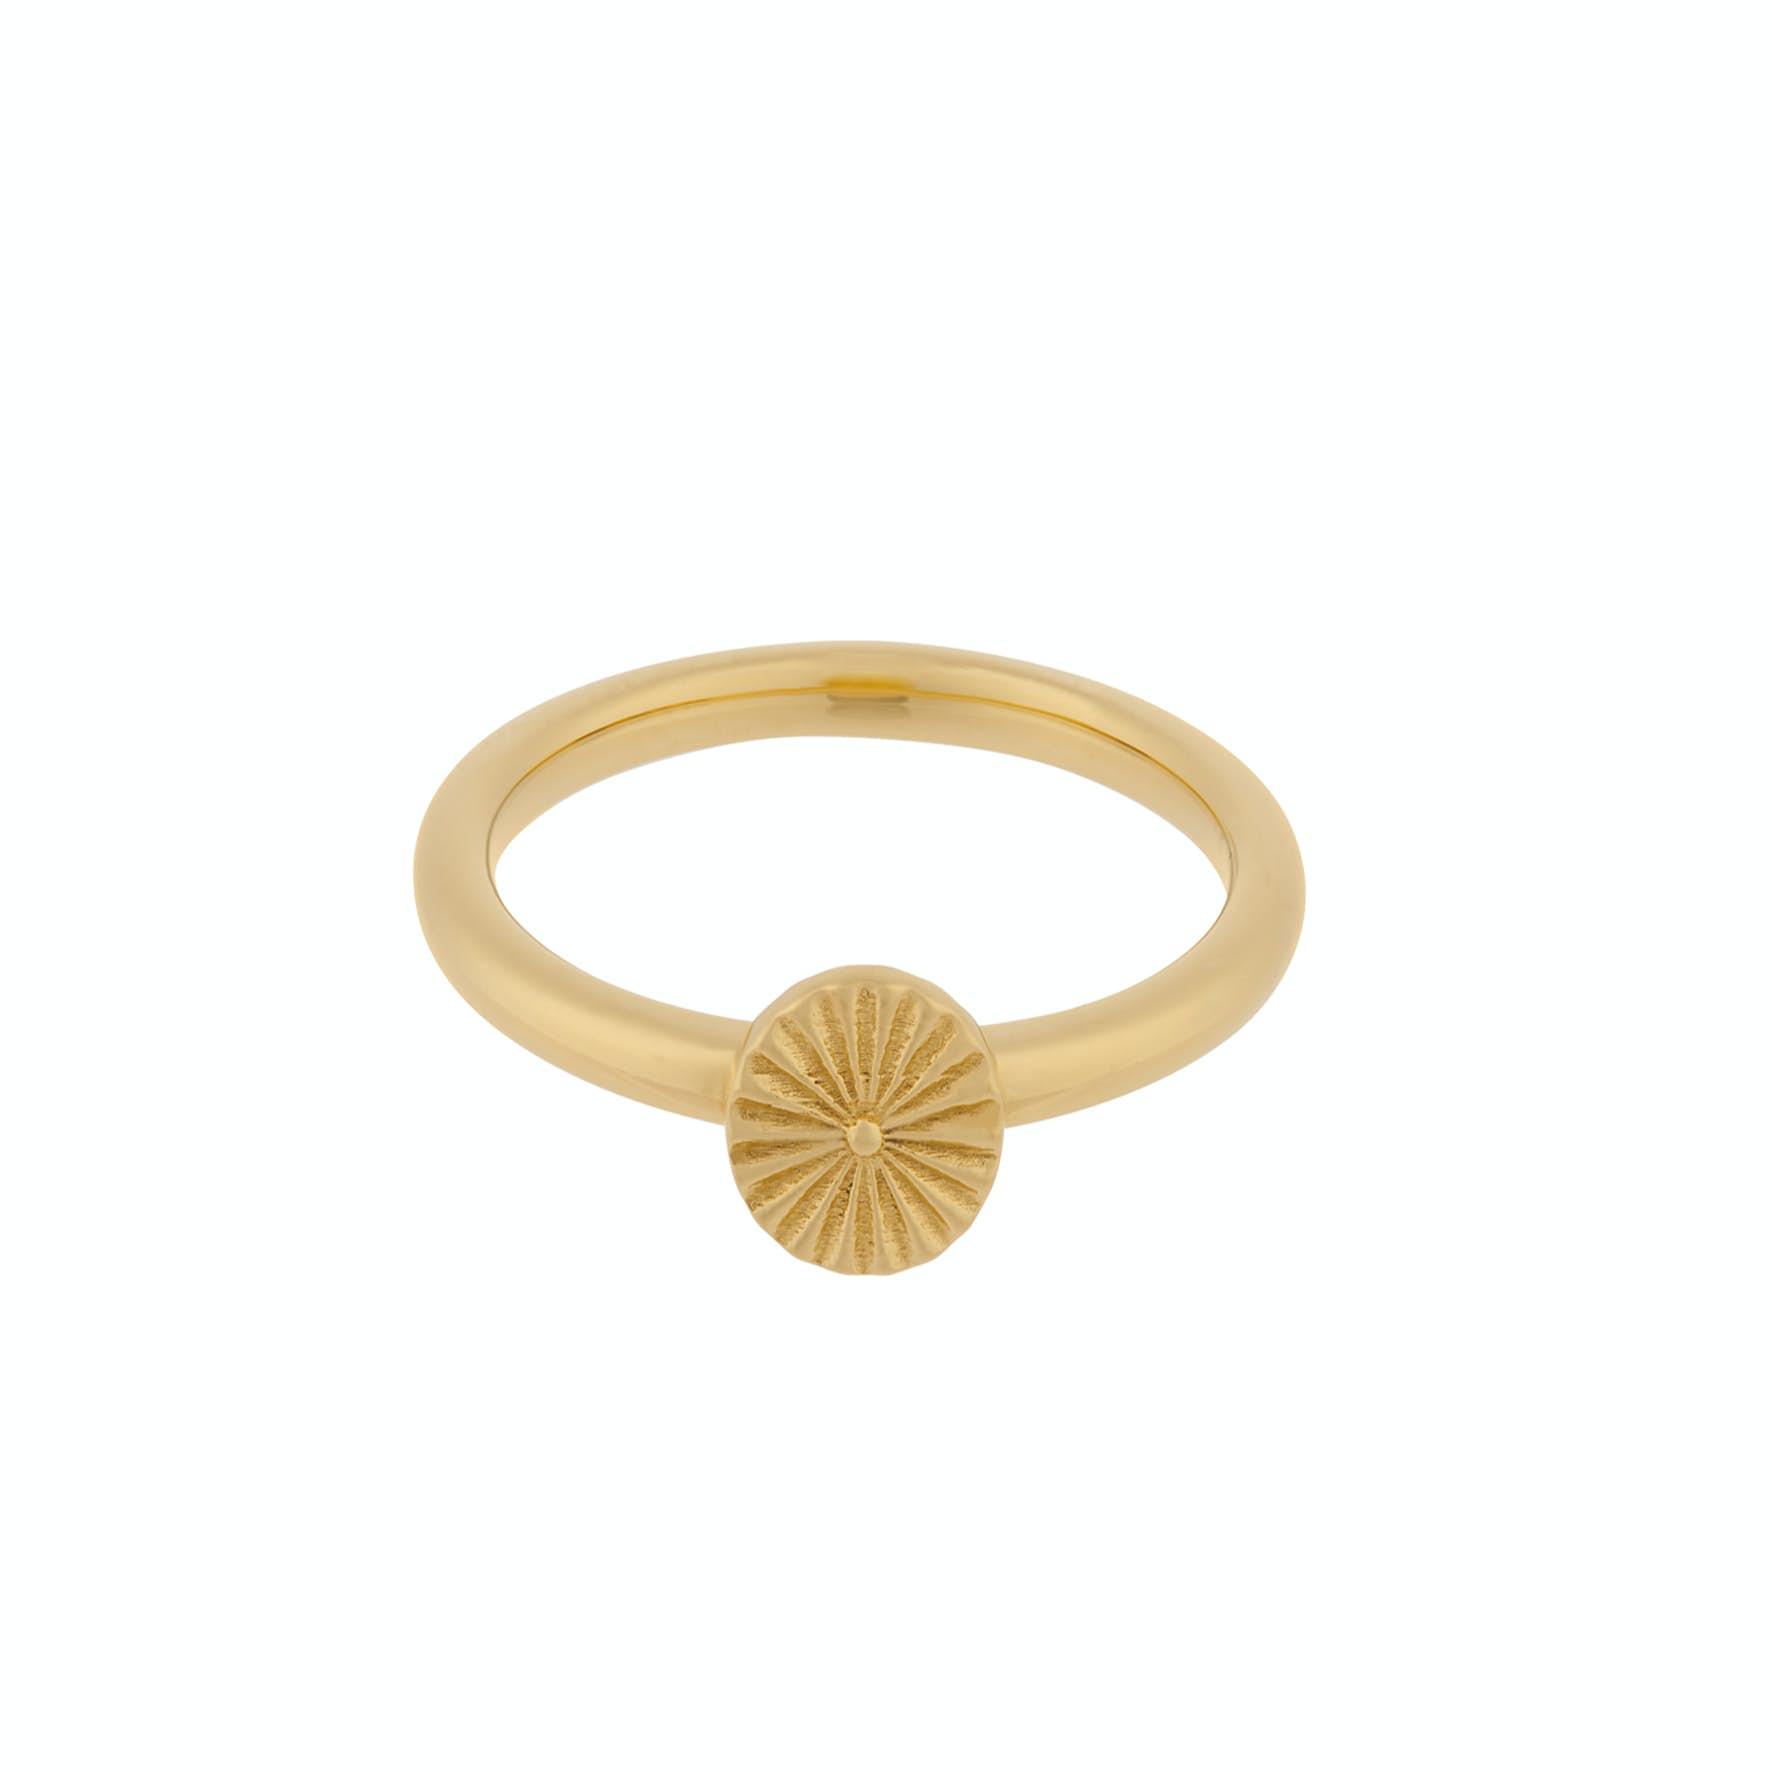 Small Sun Ring von Pernille Corydon in Vergoldet-Silber Sterling 925